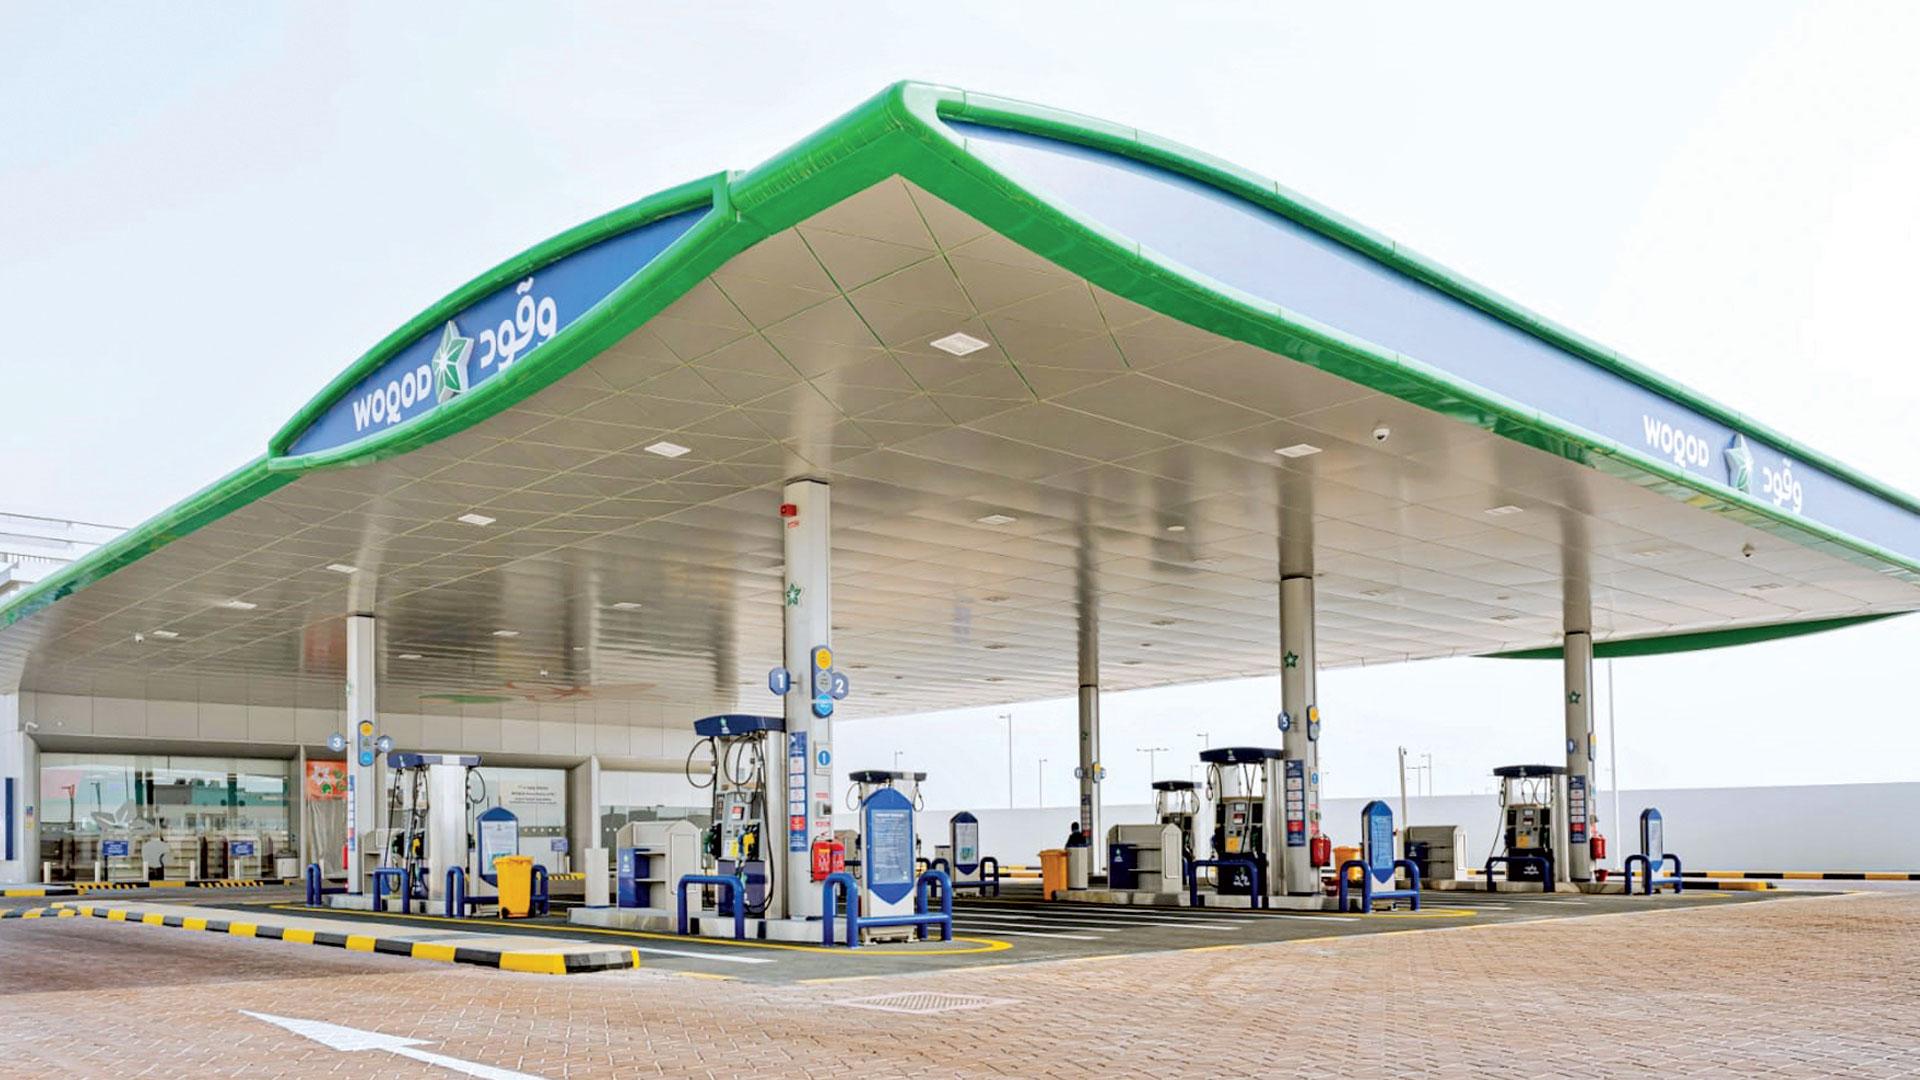 Woqod opens Waterfront petrol station